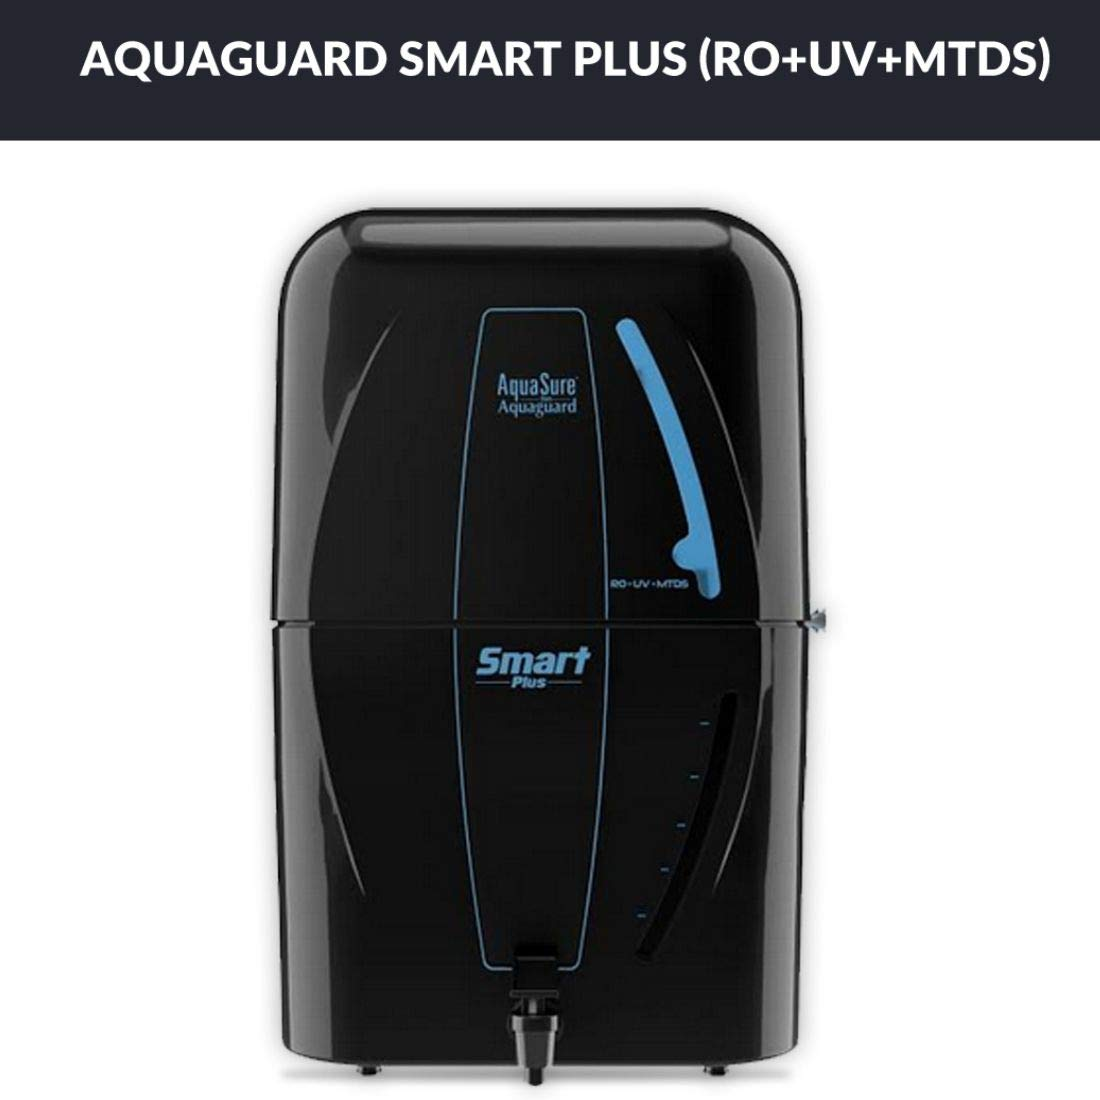 7. Eureka Forbes Aquasure from Aquaguard Smart Plus RO+UV+MTDS Water Purifier,Black